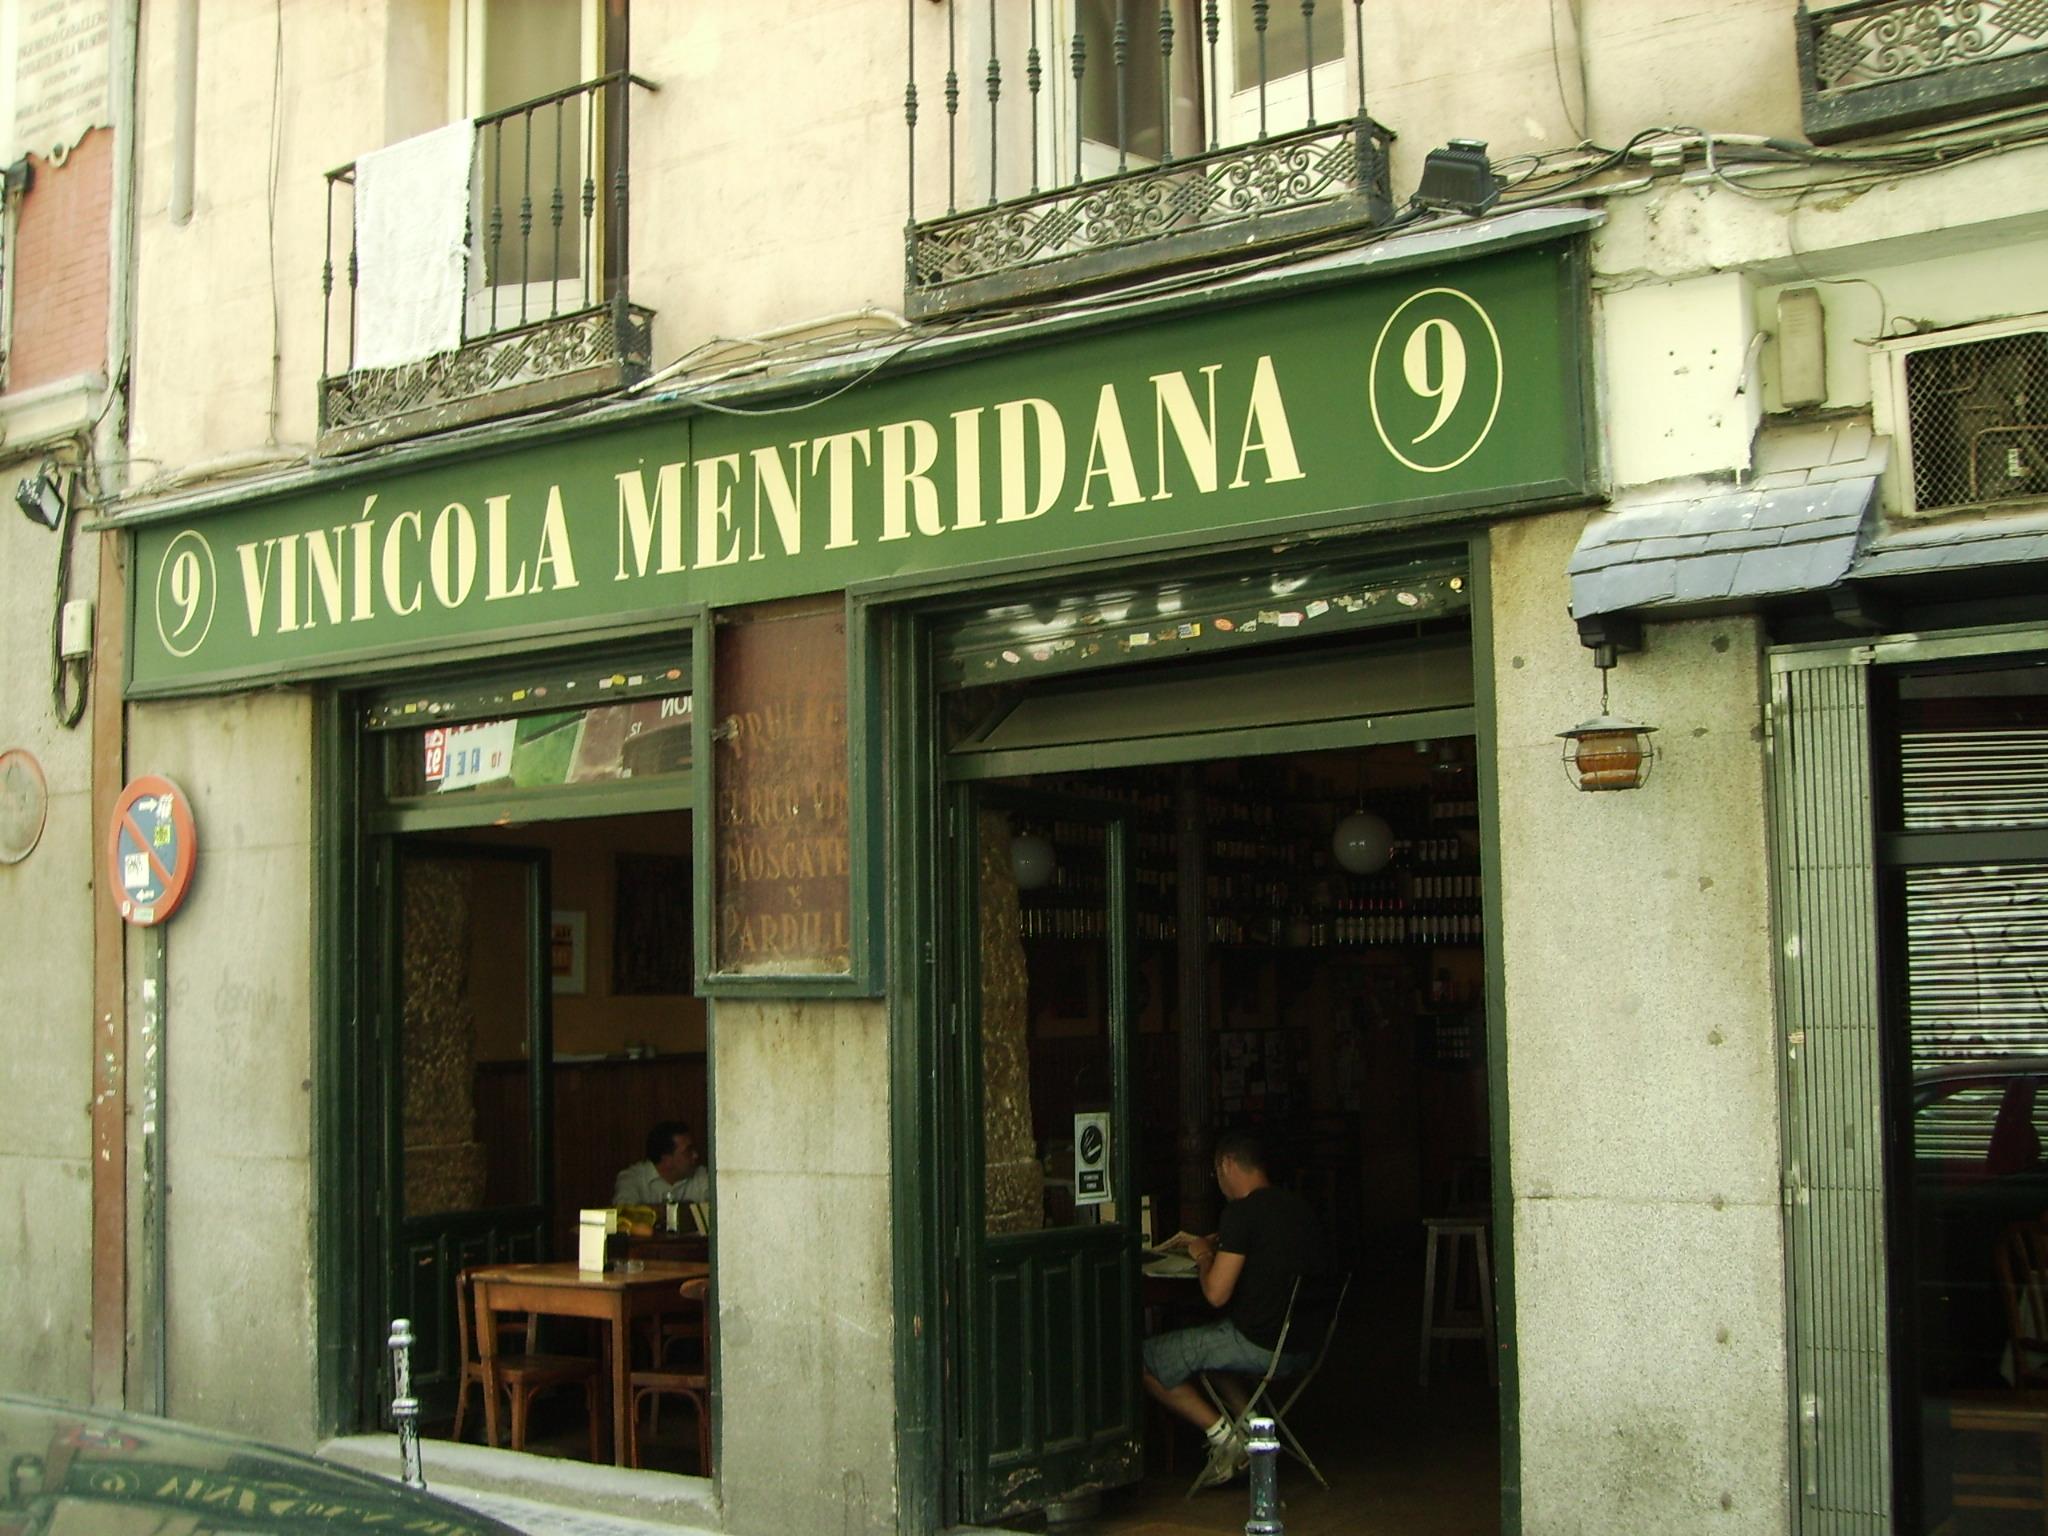 Vinicola Mentridana